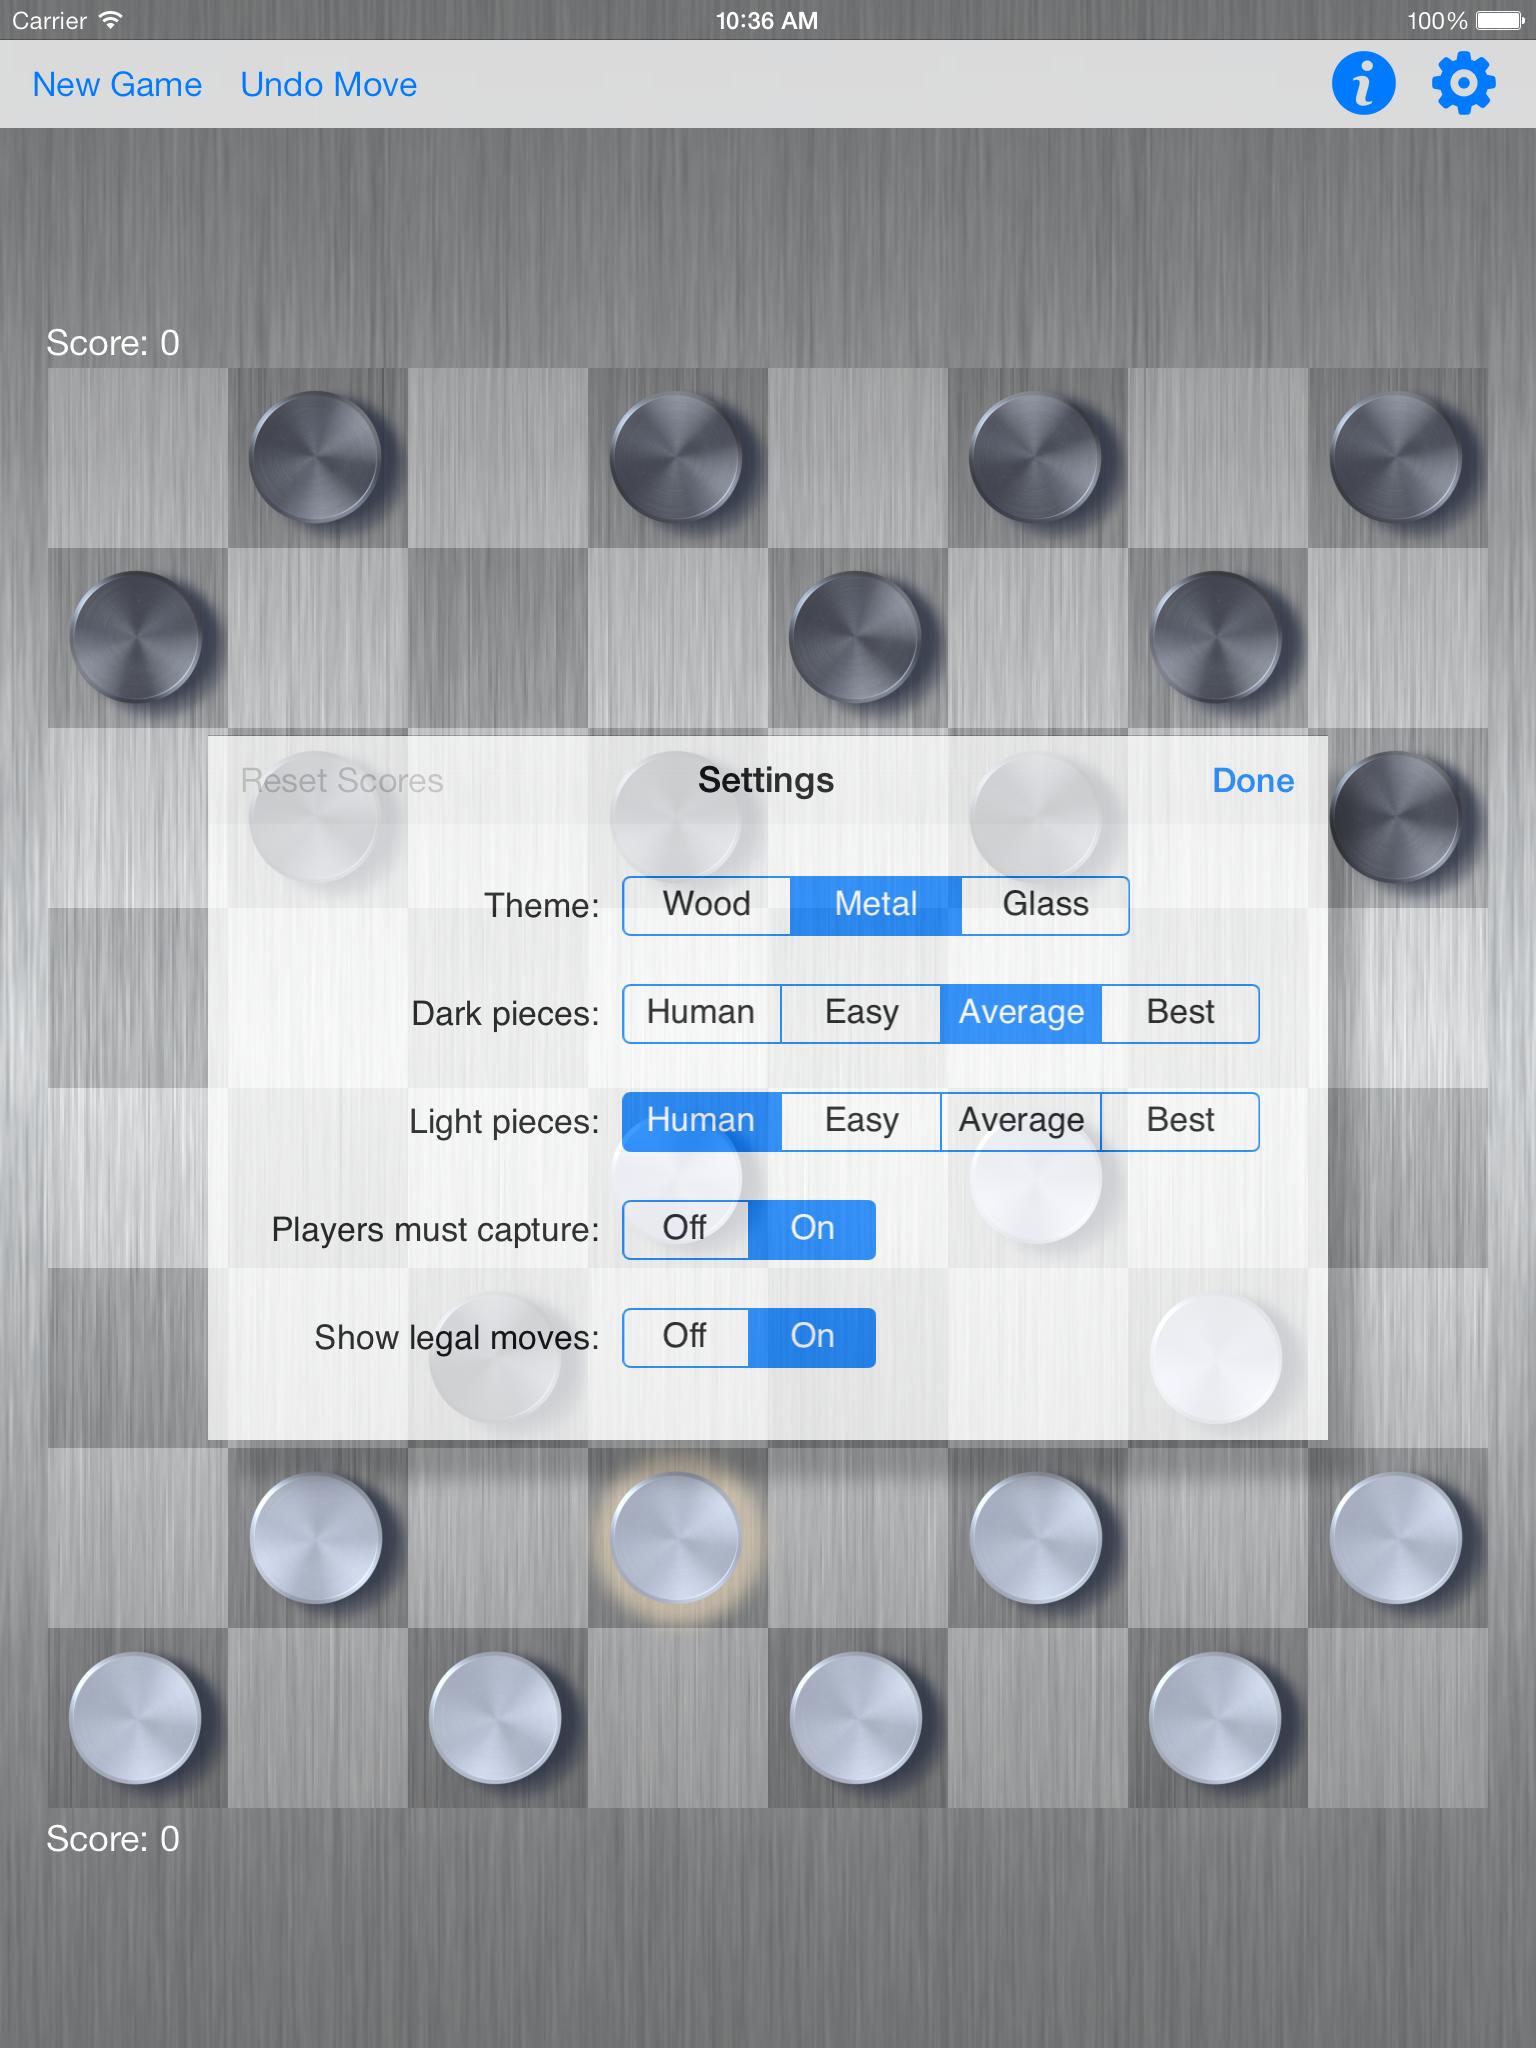 iOS Simulator Screen shot Oct 15, 2013, 10.36.59 AM.png